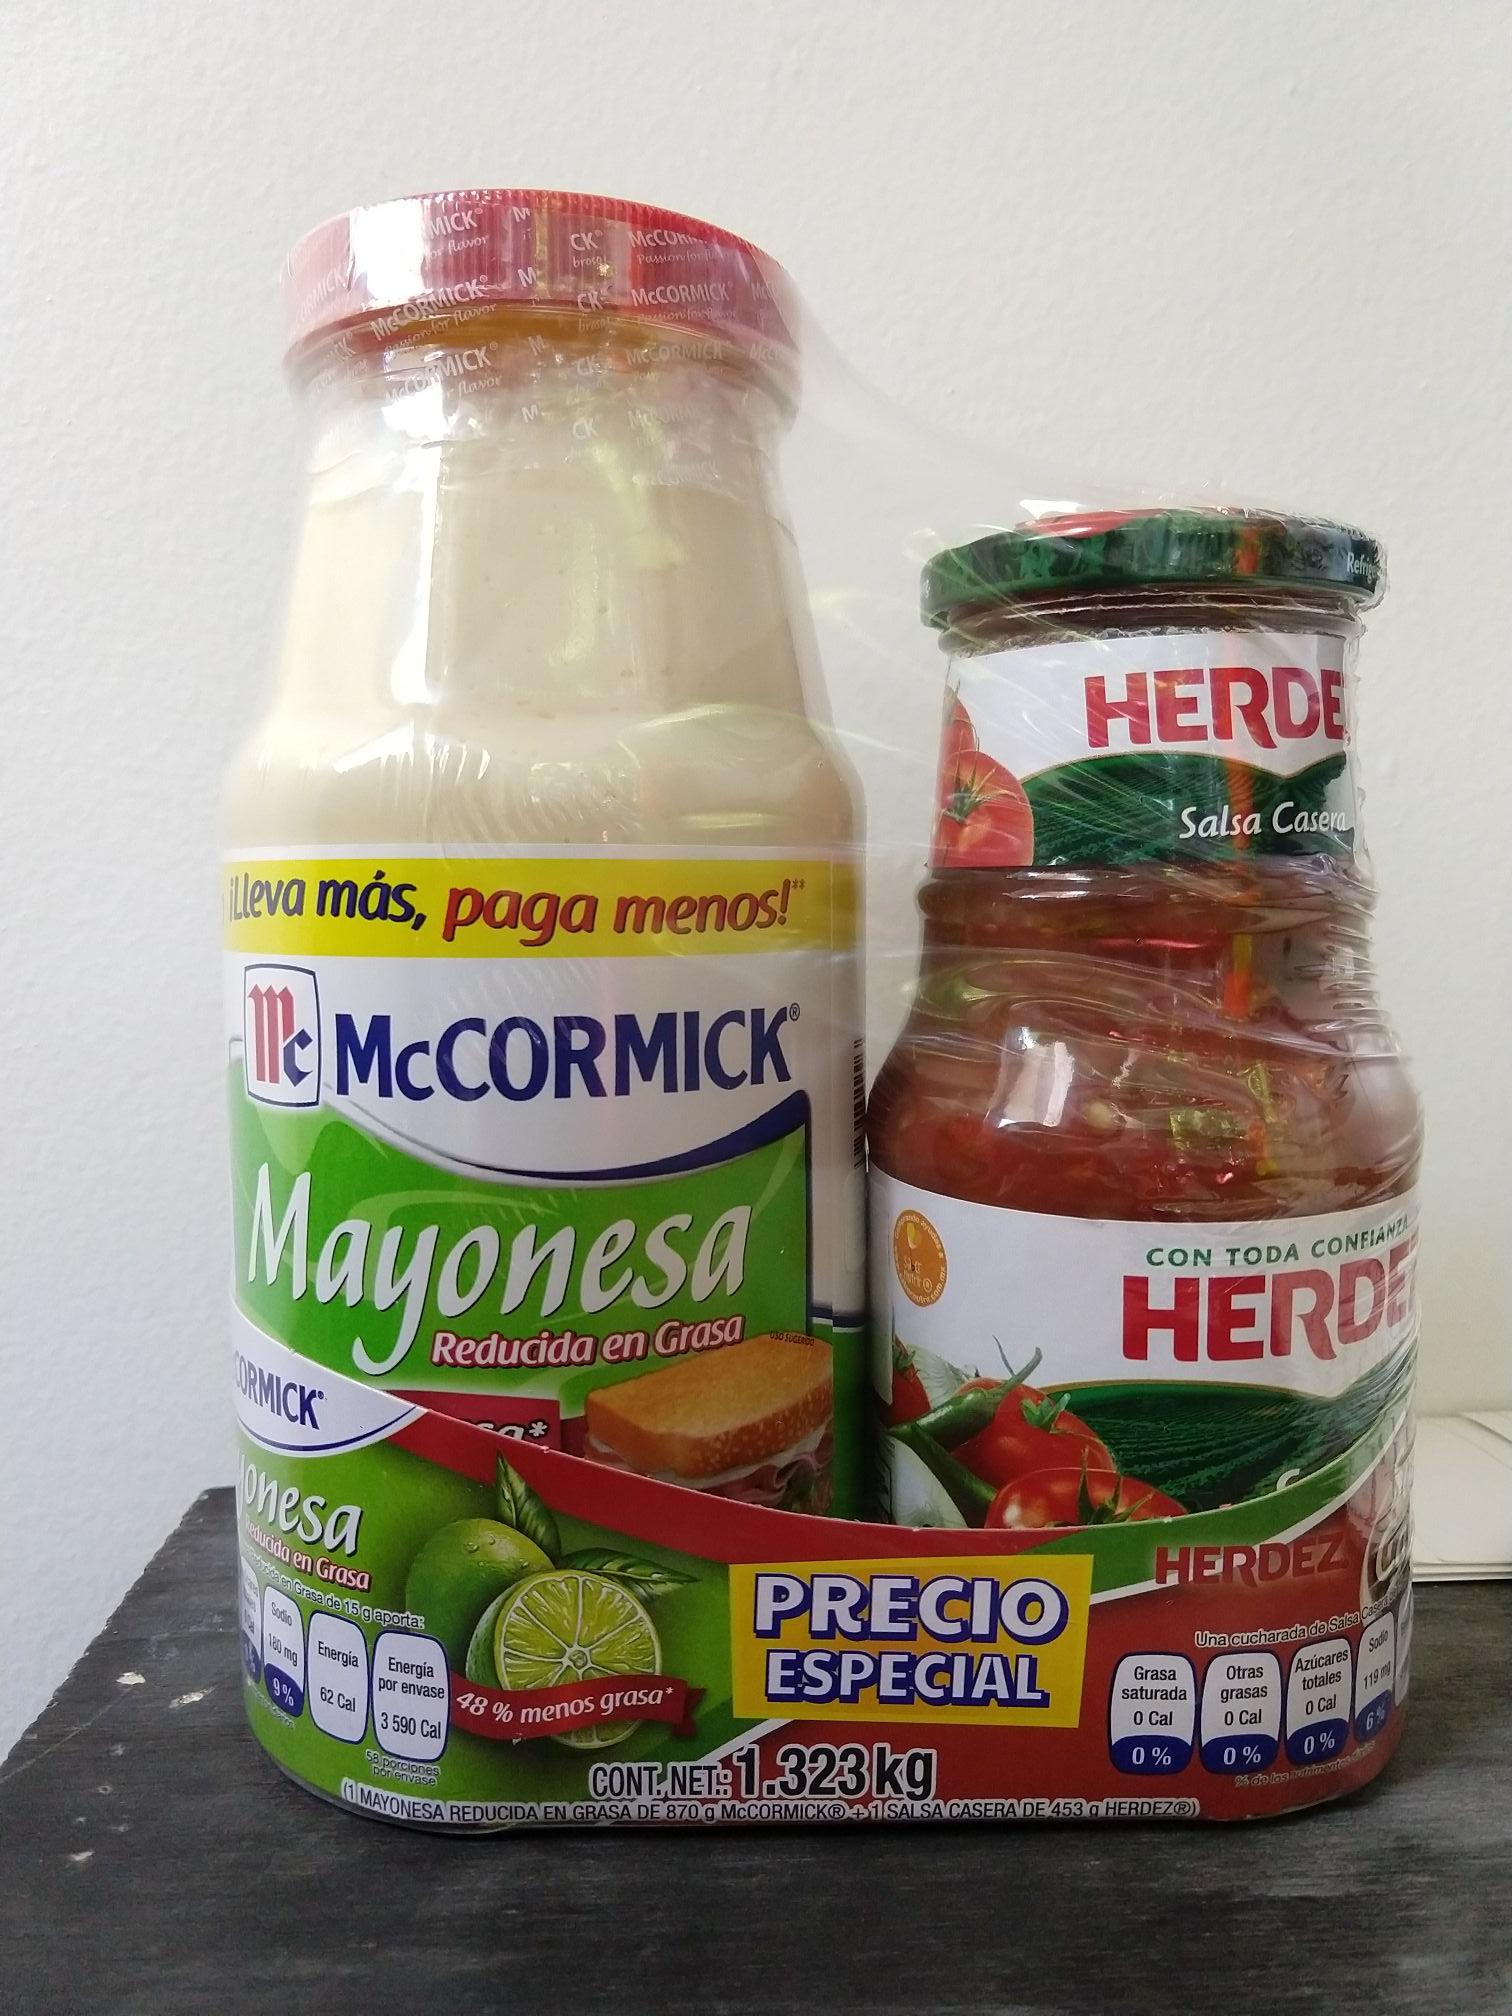 Mega Soriana. Mayonesa Mccormick reducida en grasa de 1 KG más salsa casera.